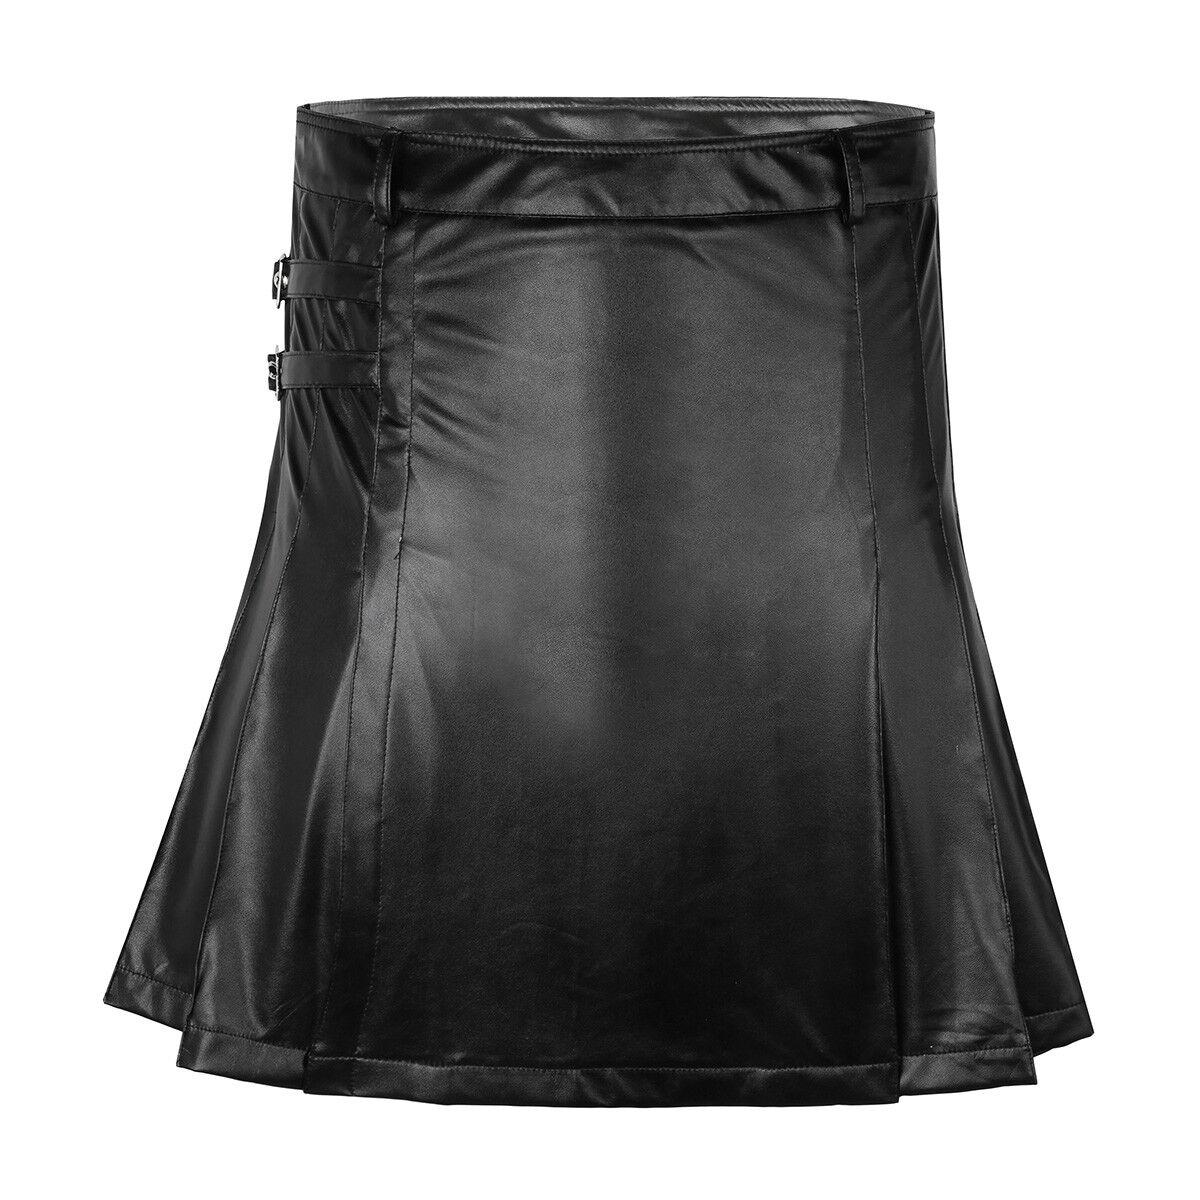 Mens Faux Leather Pleated Utility Kilt Flat Buckled Split Scotish Utility Kilt